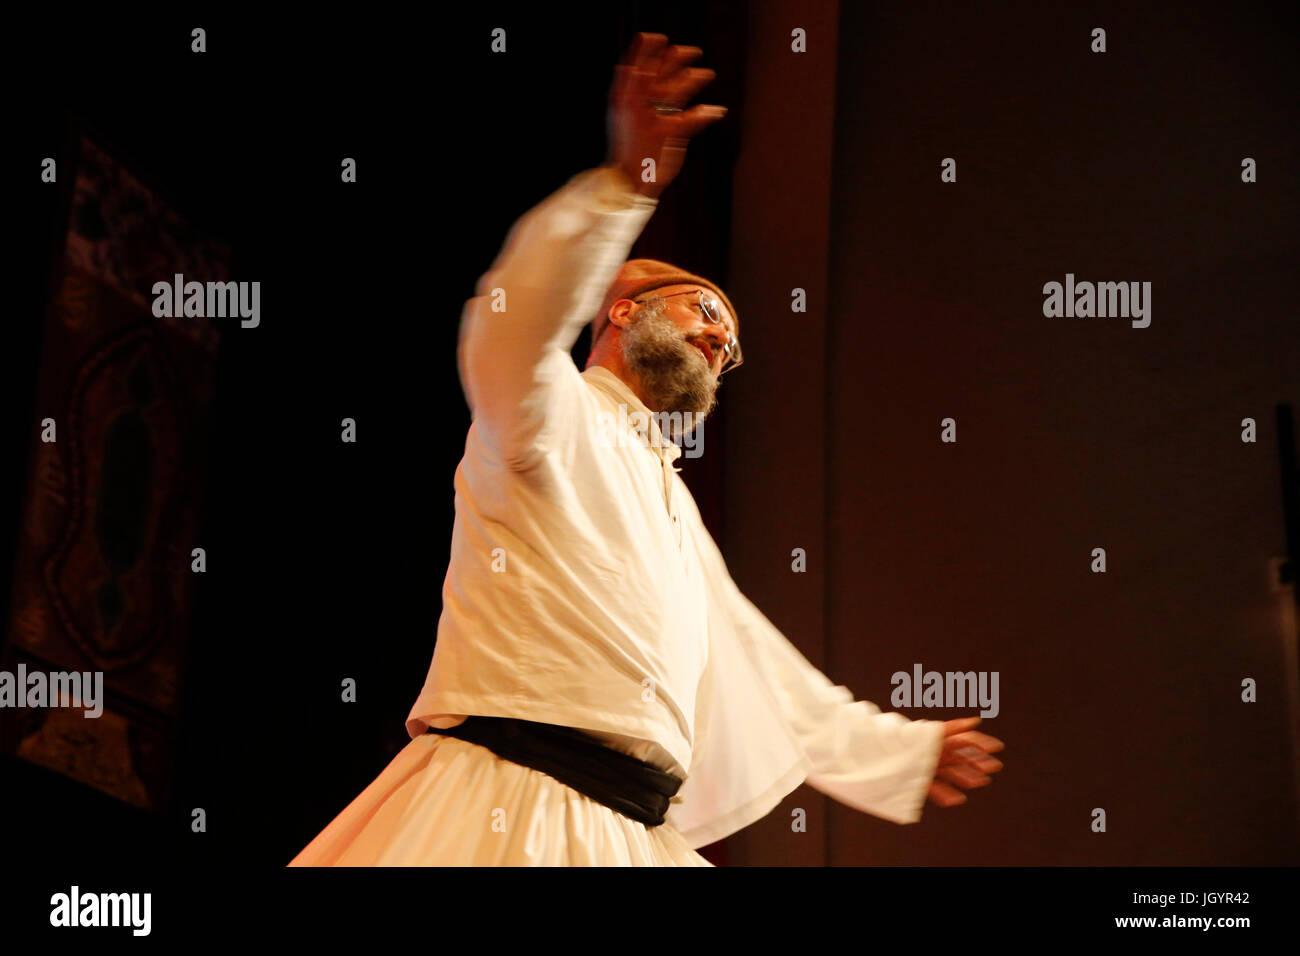 Grand Mawlid de Paris sufi celebration. Dervish Omar, Naqshbandi.  France. - Stock Image